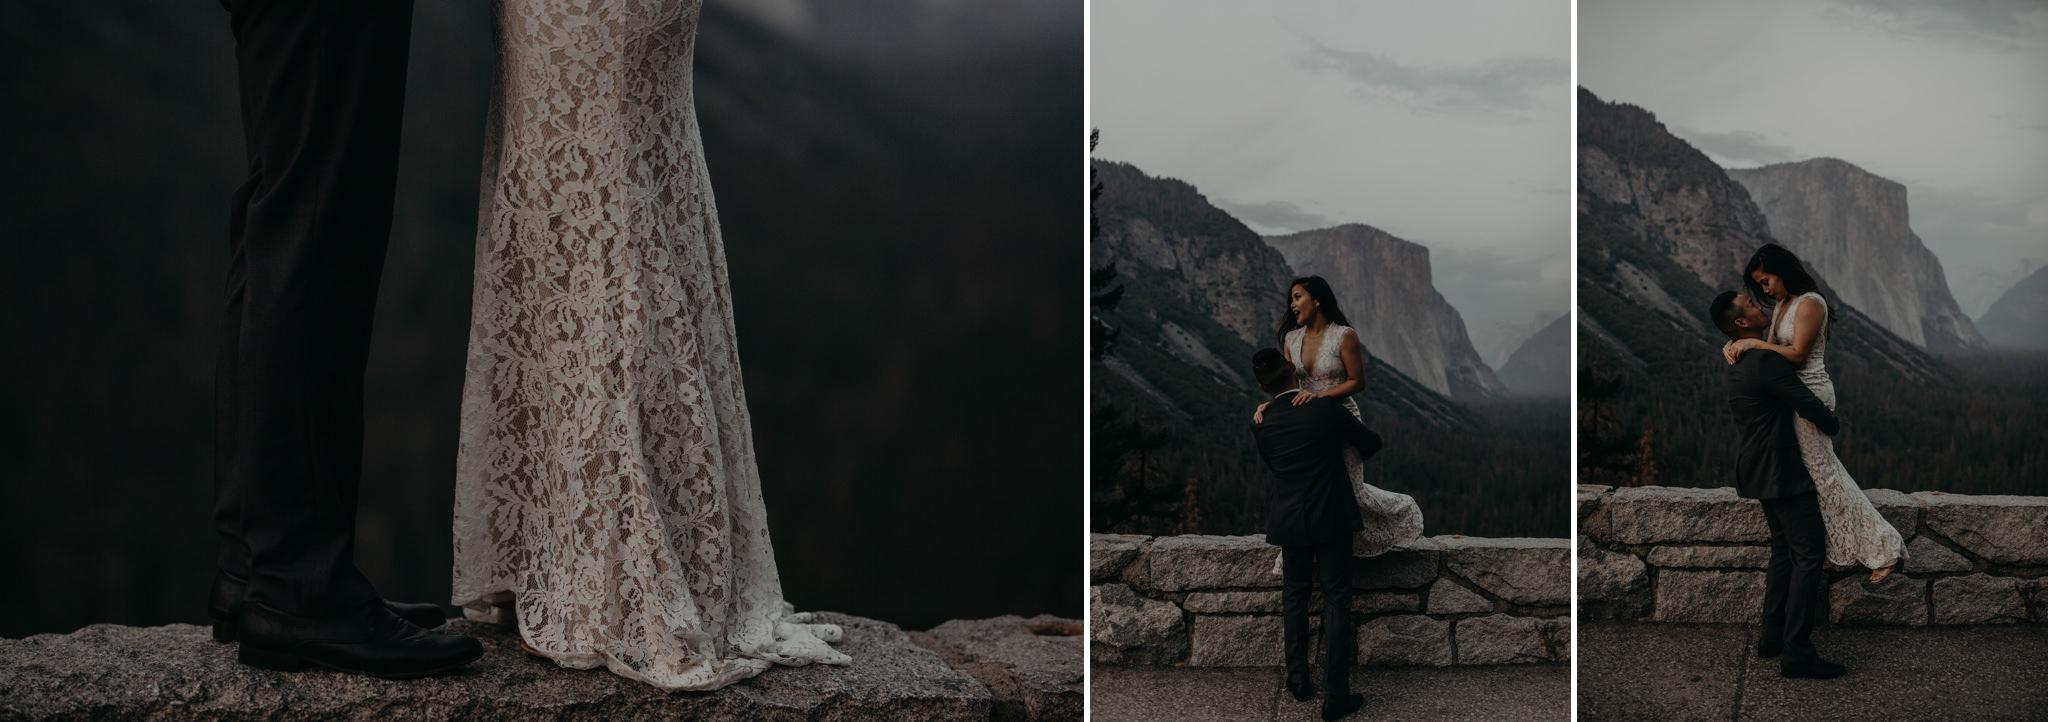 Yosemite-Wedding-Photographer11.jpg